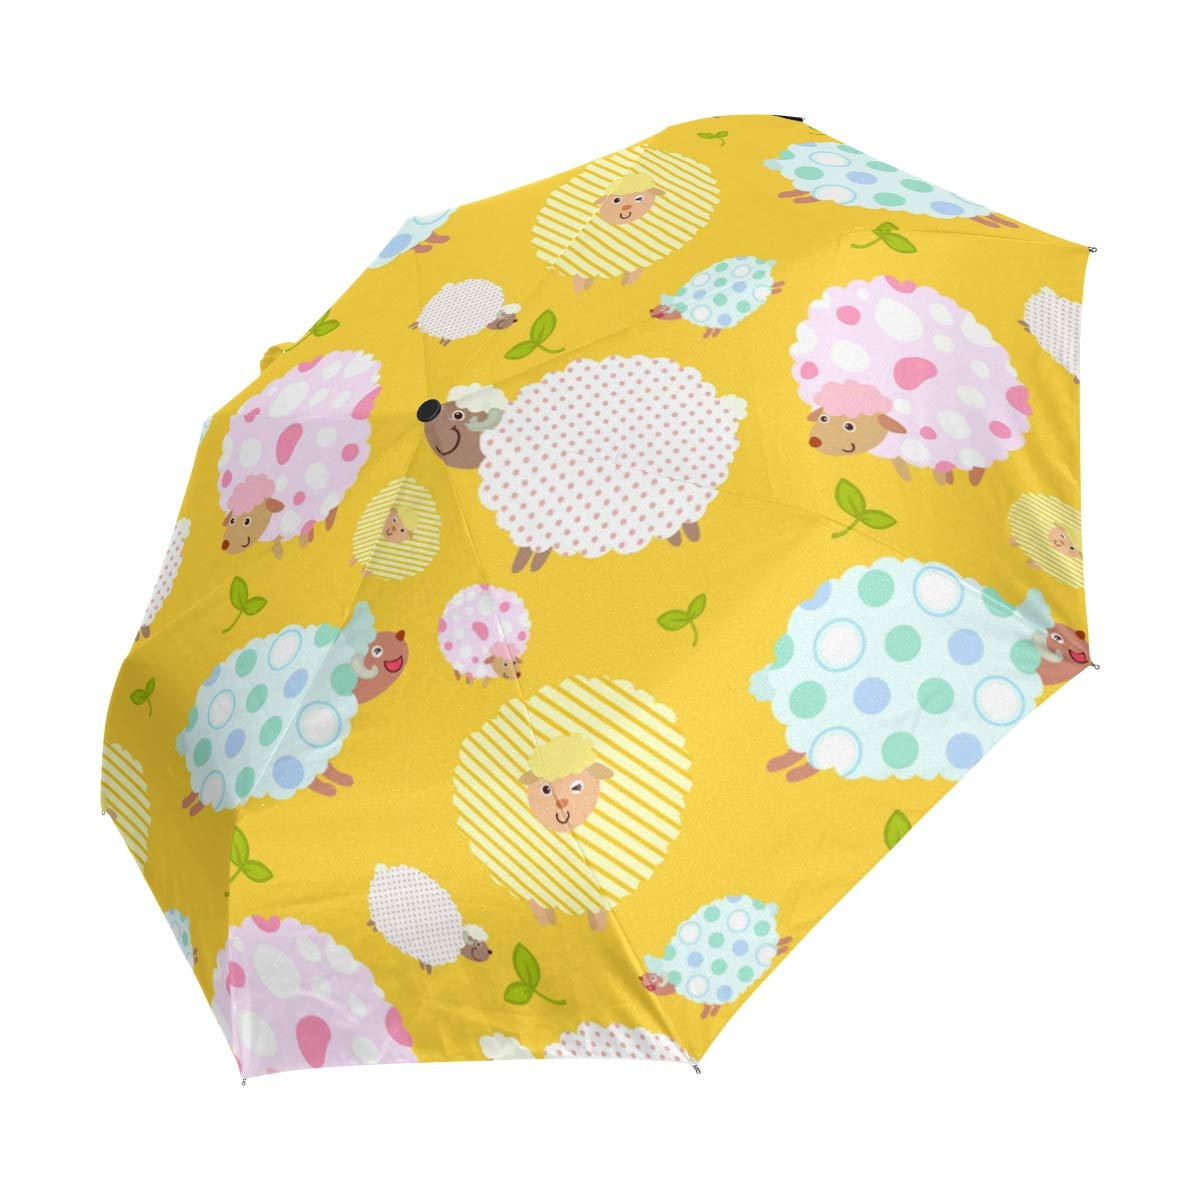 FVFV かわいい猫の鳥 自動折りたたみ傘 UV保護 自動開閉 折りたたみ 防風 日除け 旅行 ビーチ 女性 子供用 B07L9JYTTJ パターン2